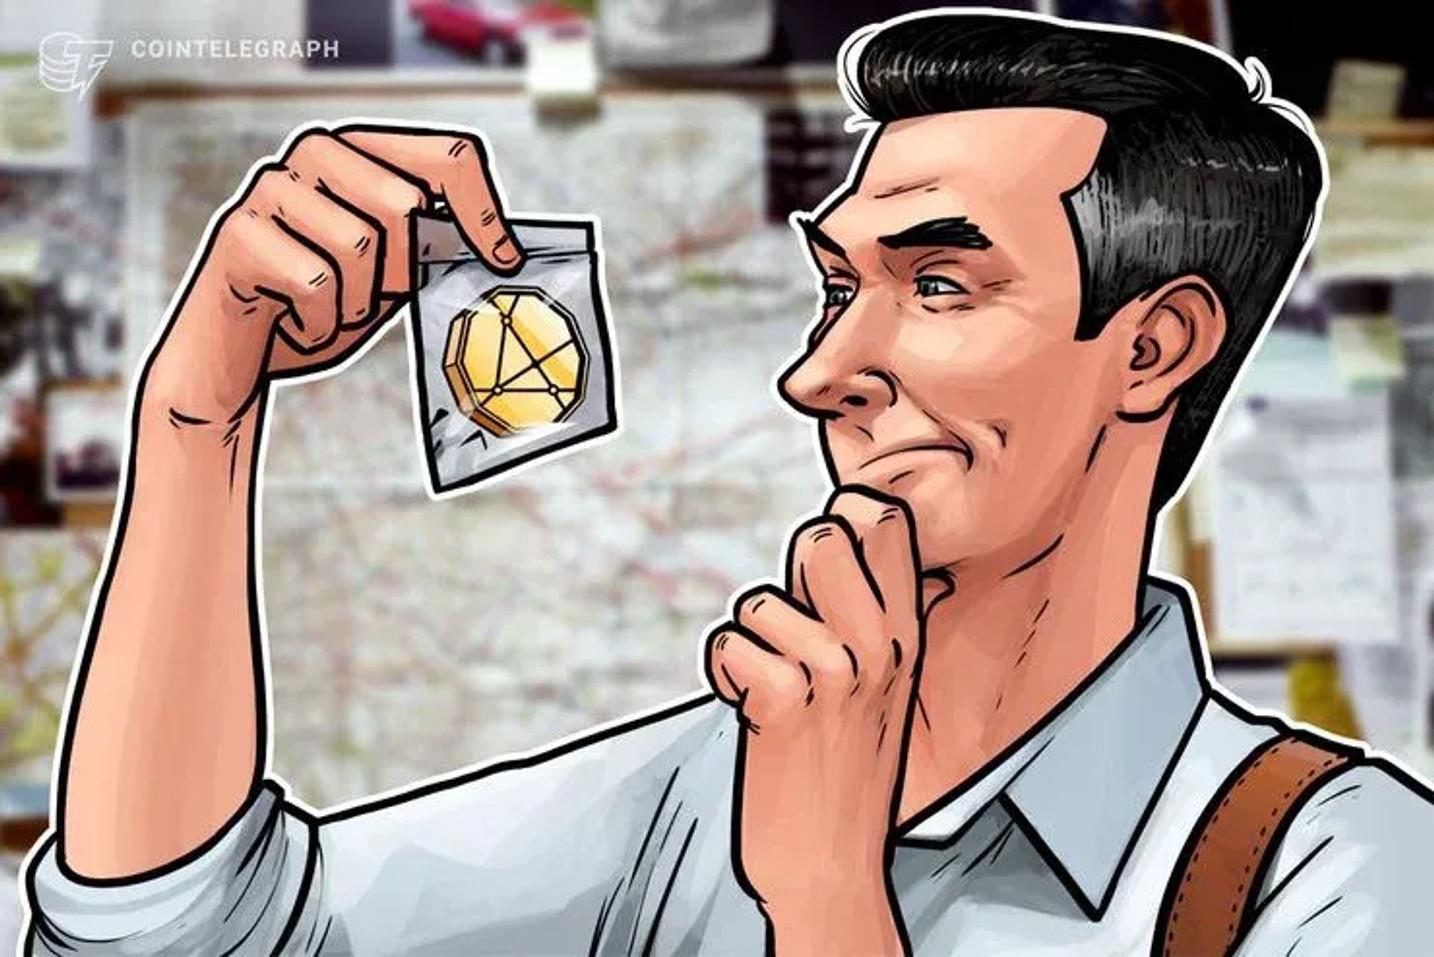 Justiça aciona Mercado Bitcoin, Atlas Quantum, Bitcoin Trade e FoxBit em busca de Bitcoins da Miner, suposta pirâmide